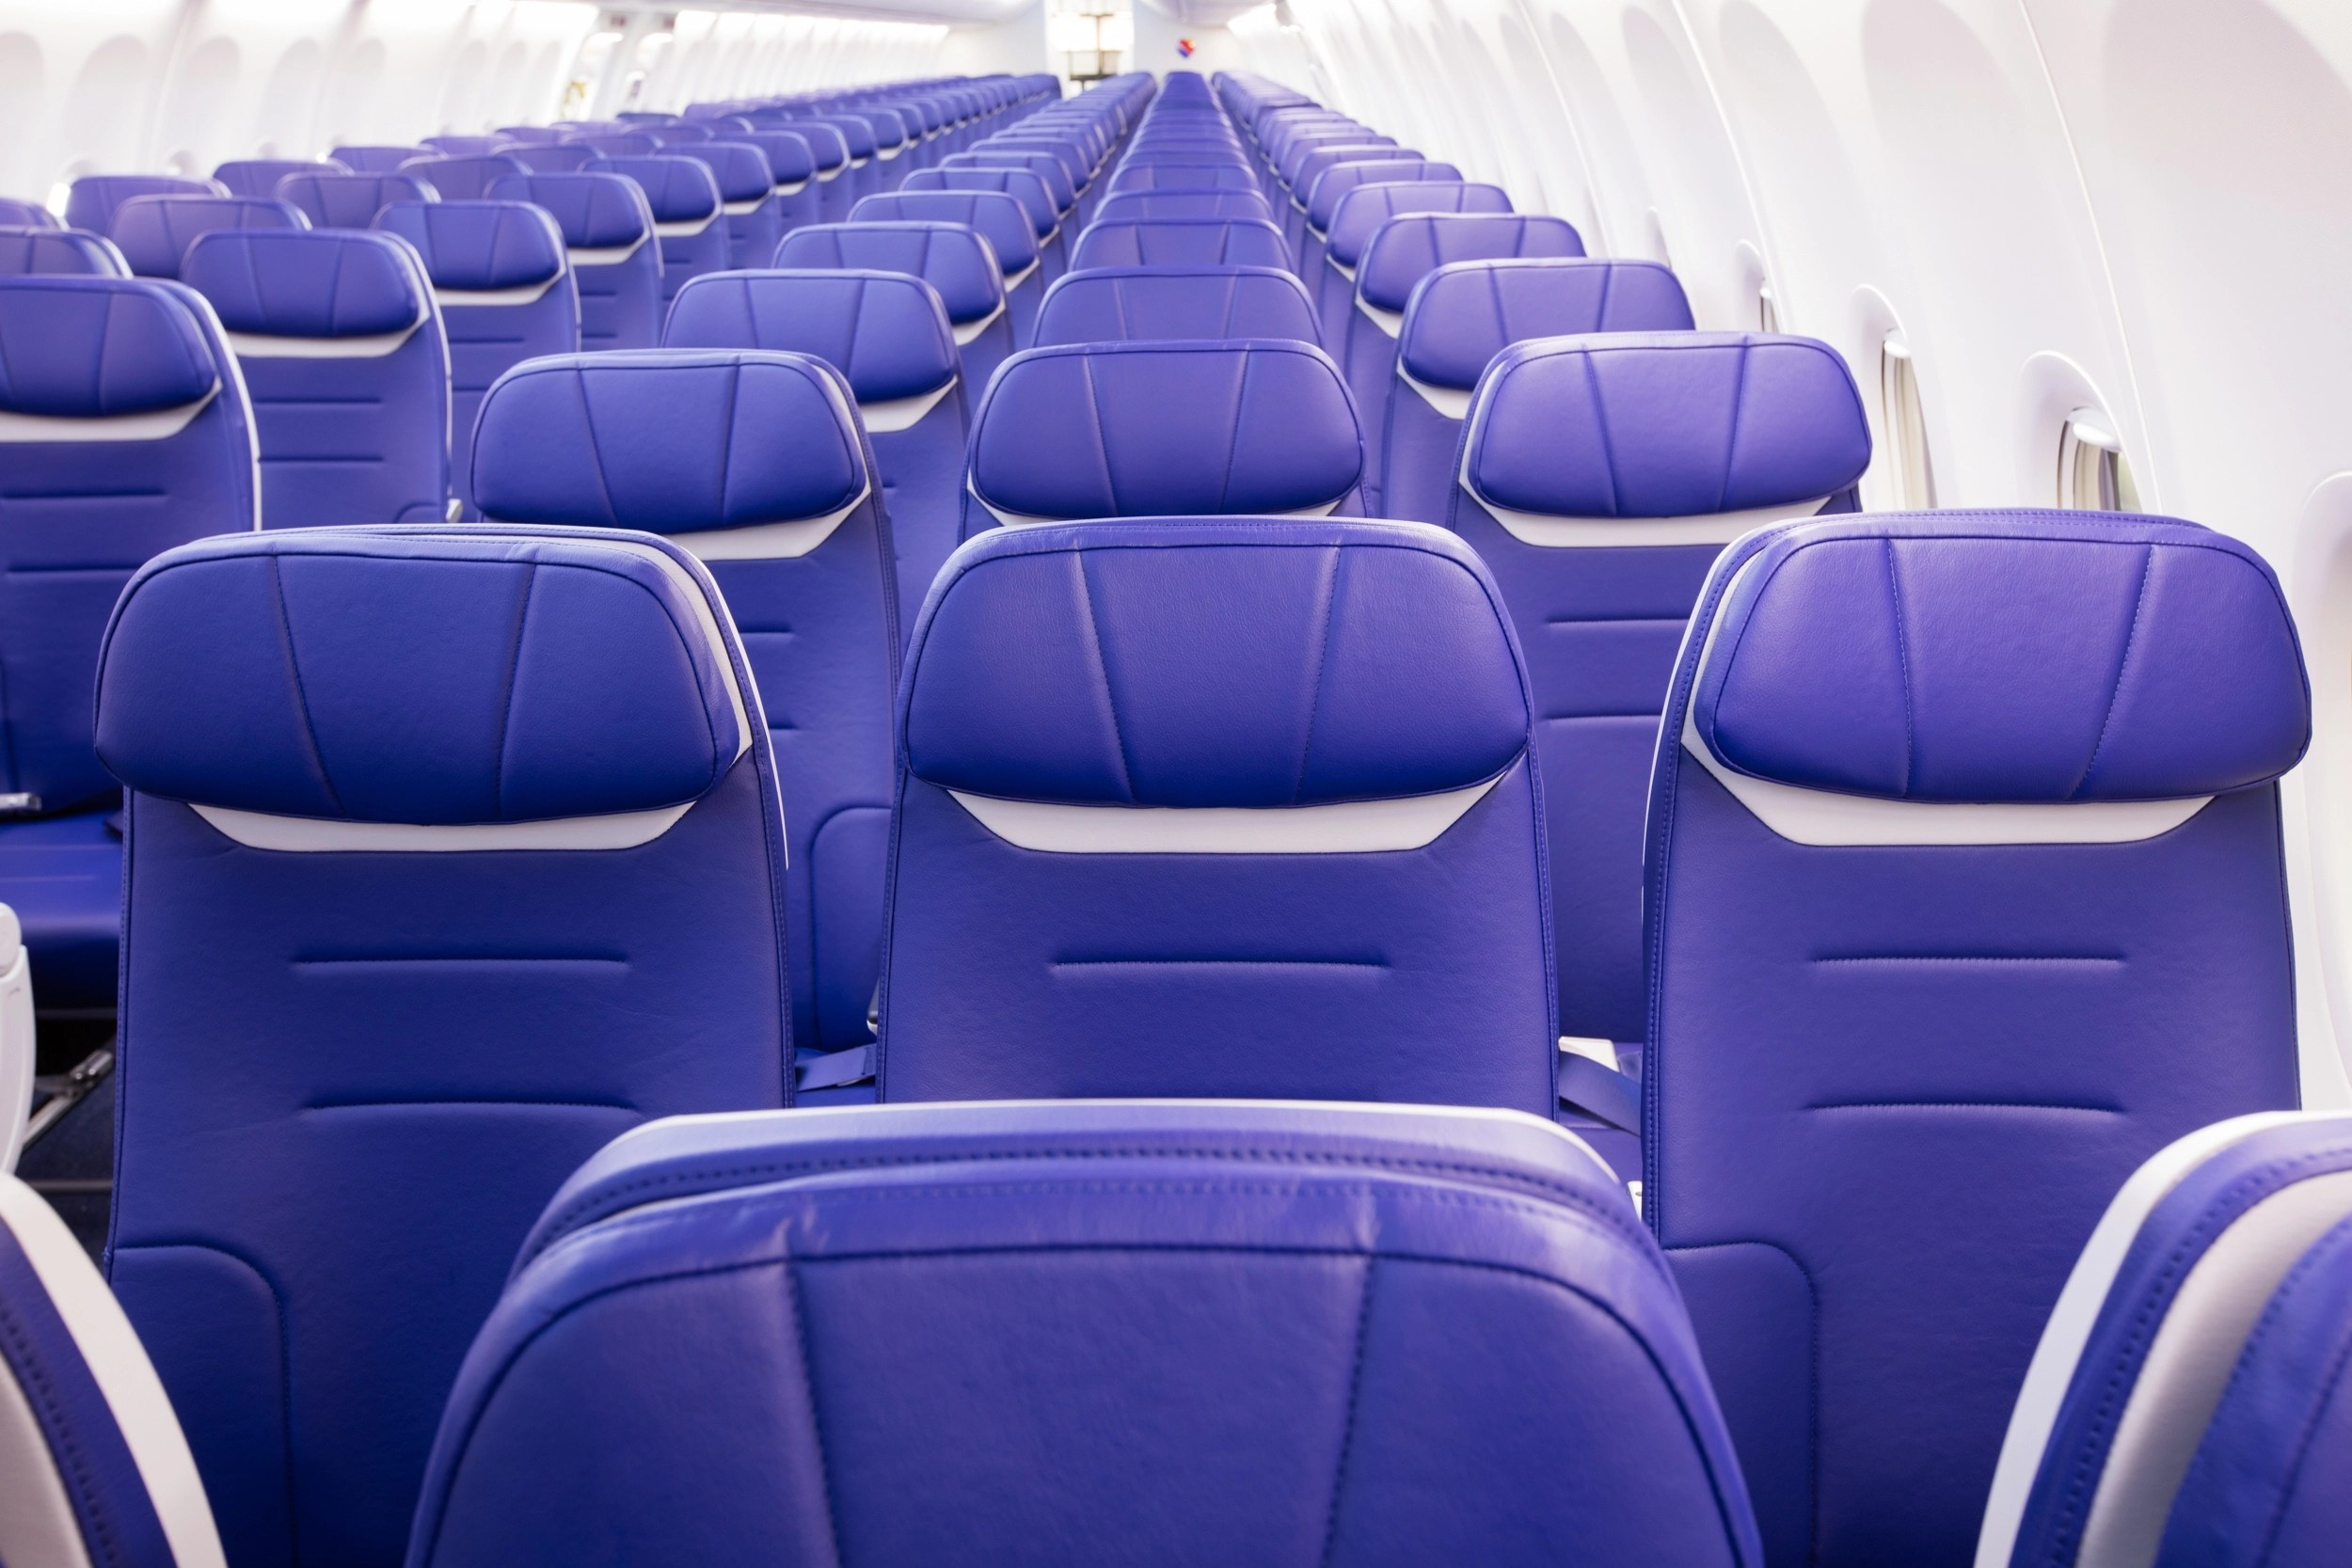 Southwest unveils new uniforms widest 737 economy seat for New interior